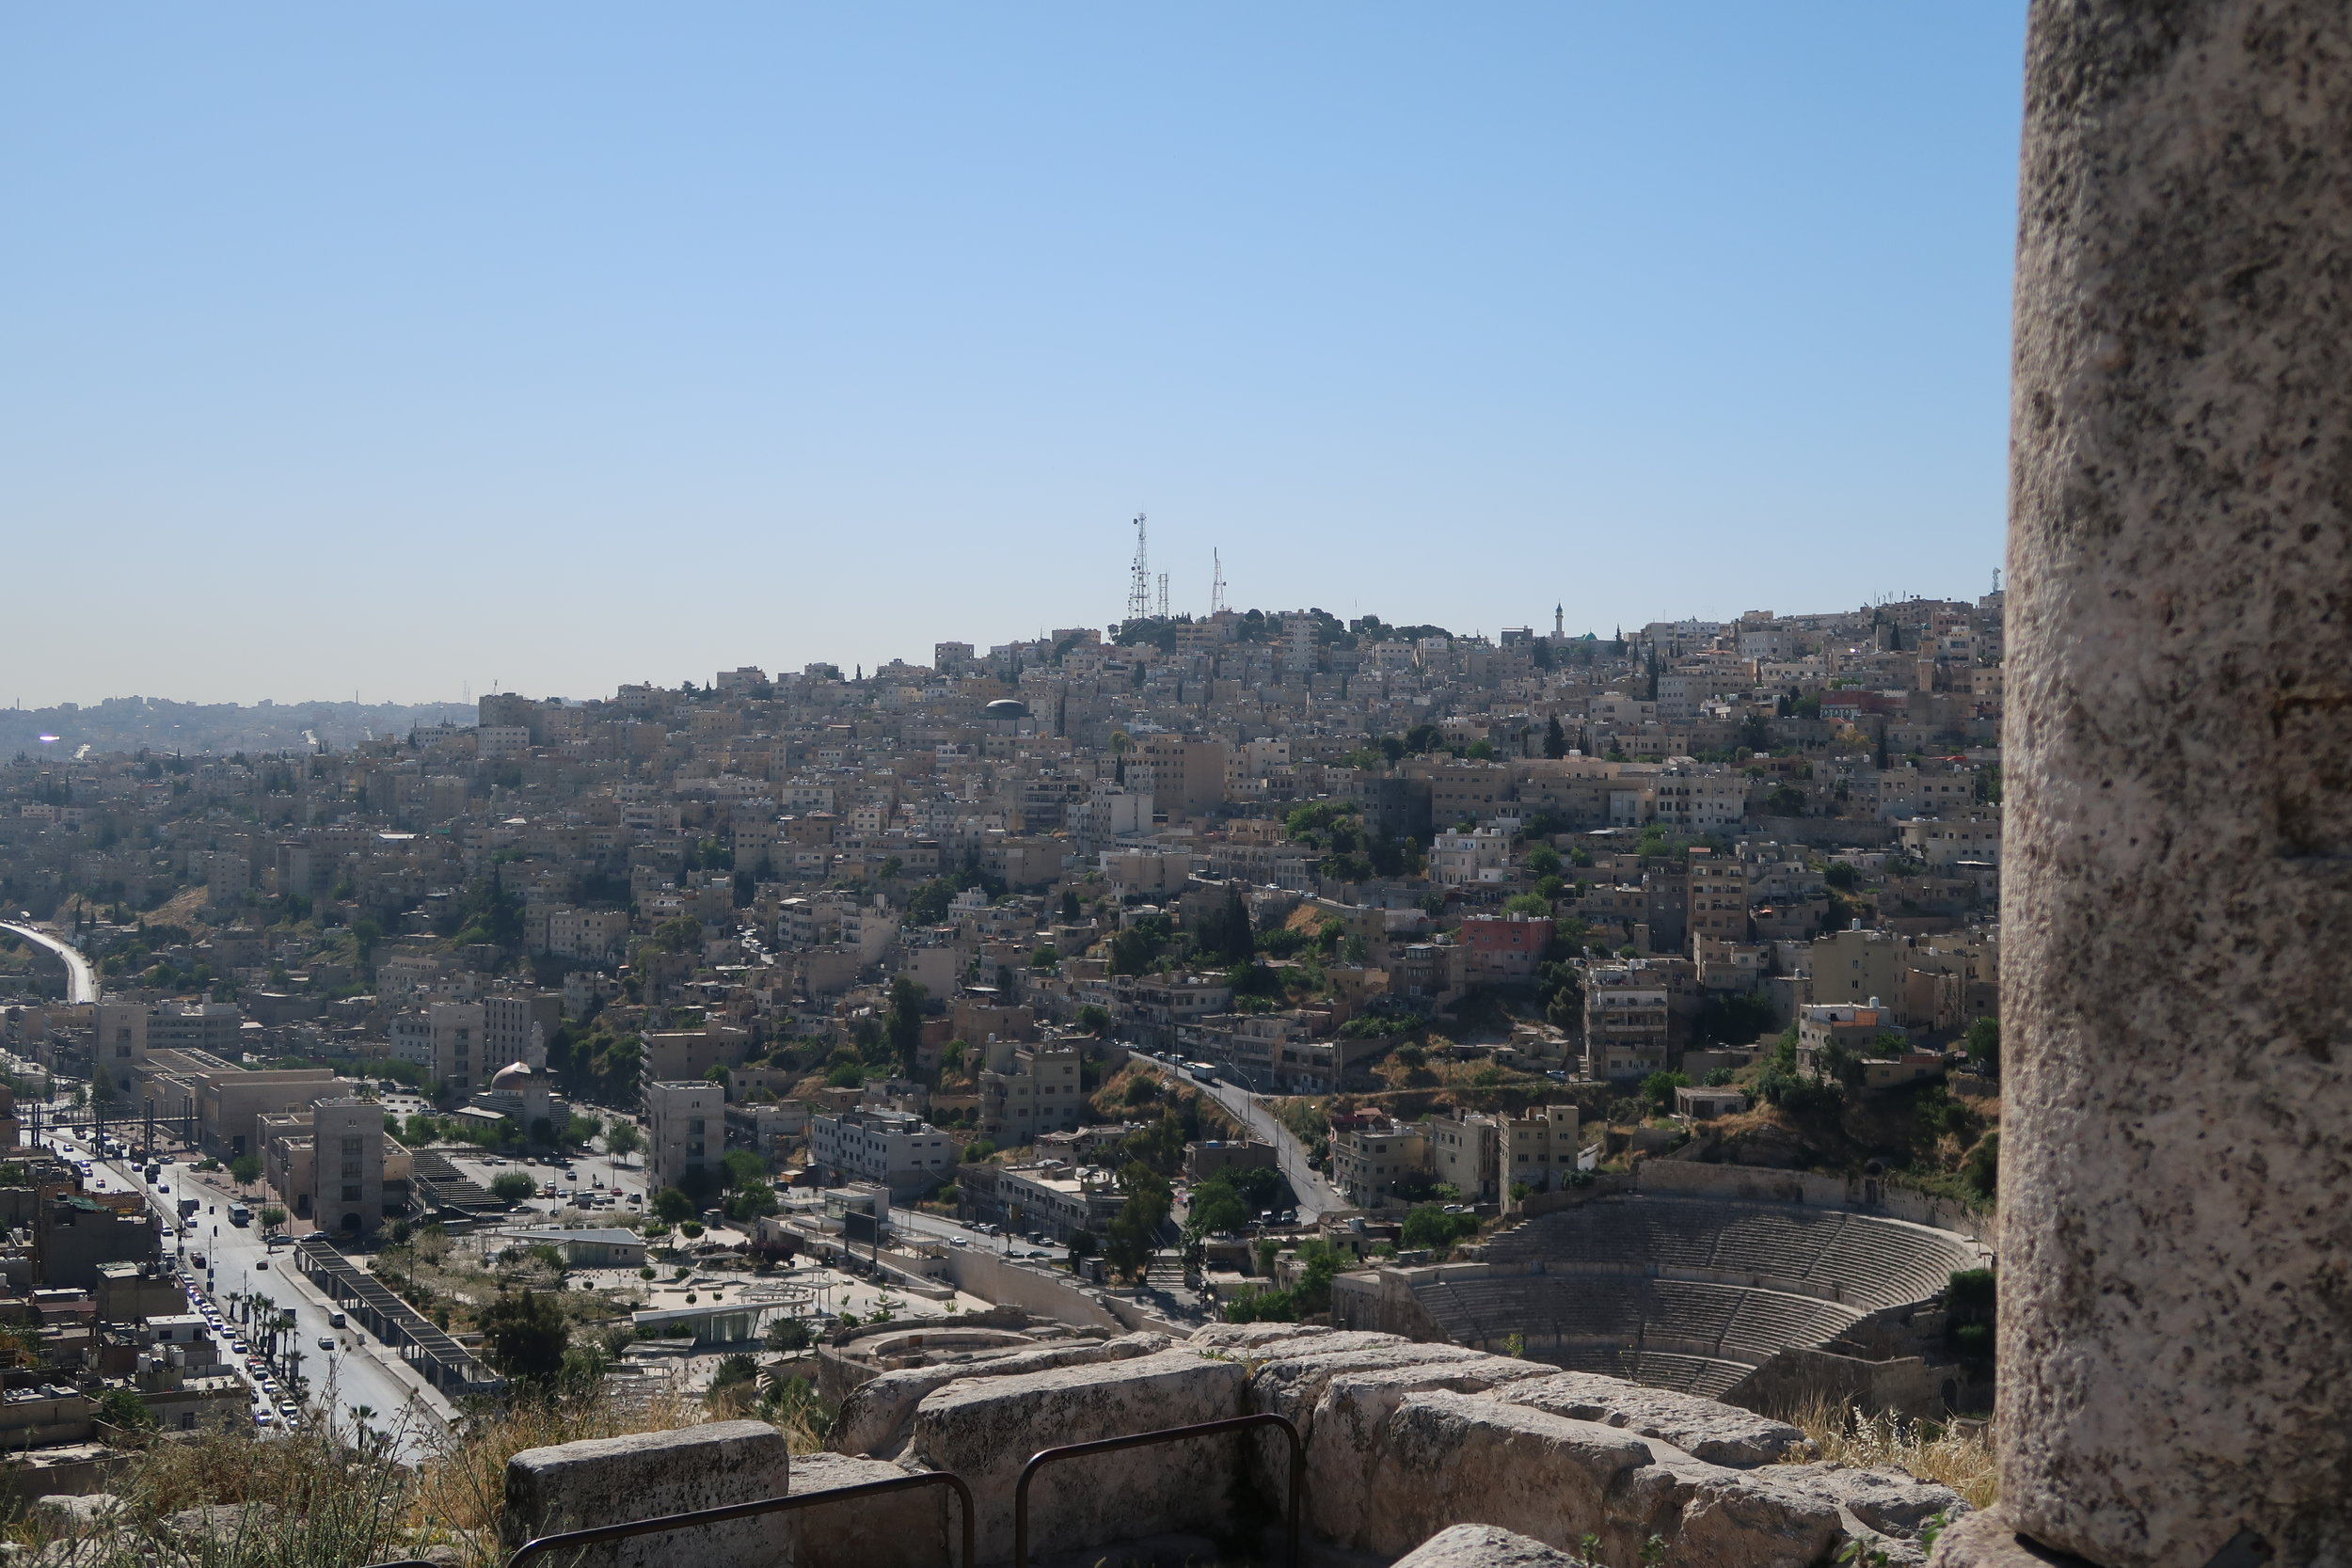 upsouth-mingmingfeng-jordan-travel-amman-day2-view-from-amman-citadel.JPG